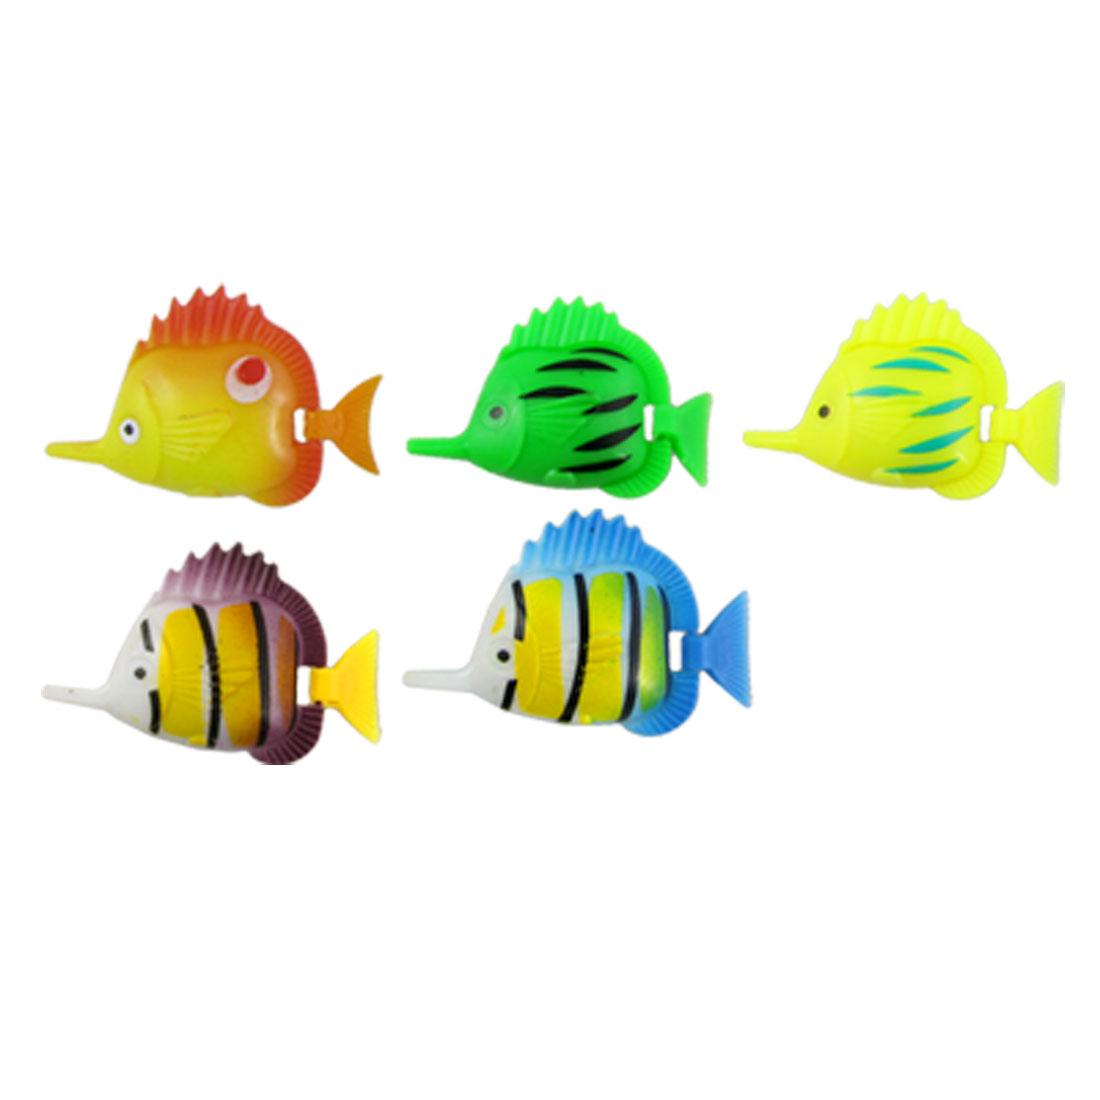 Colorful Flexible Tail Tropical Fish Ornament 5 Pcs for Aquarium Tank